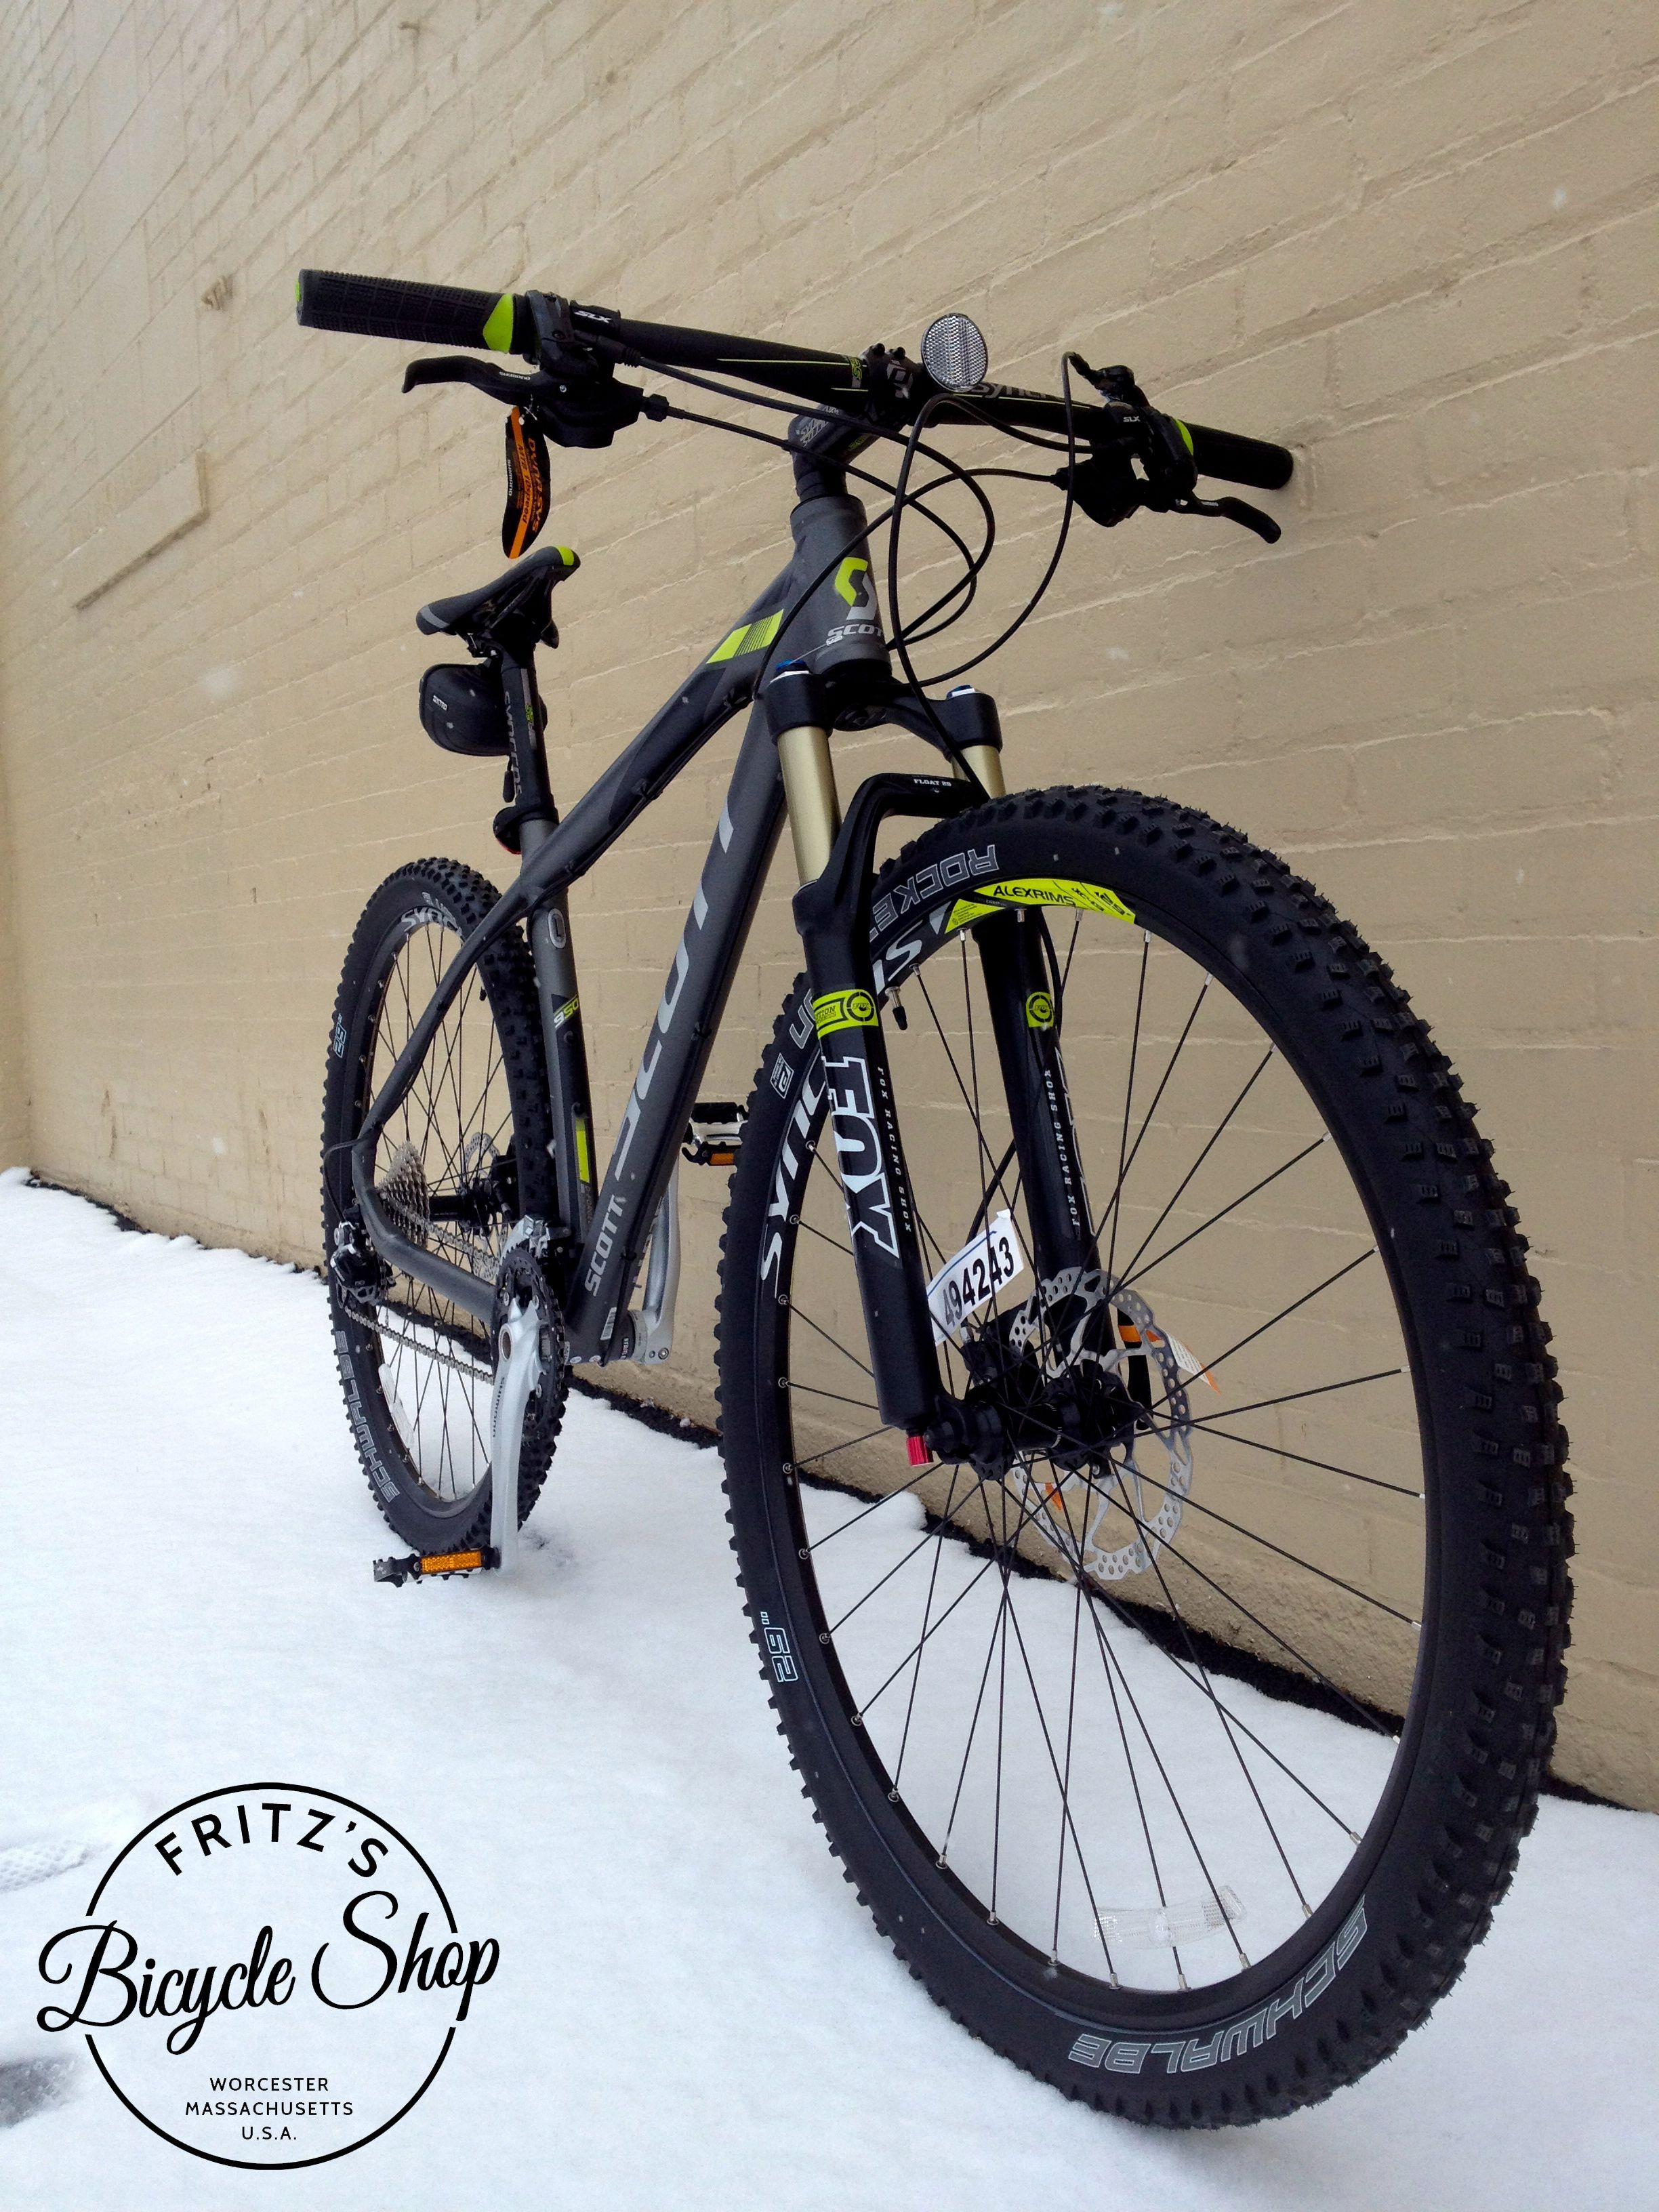 The Custom Butted 6061 Aluminum Scott Scale 950 Is A Lightweight